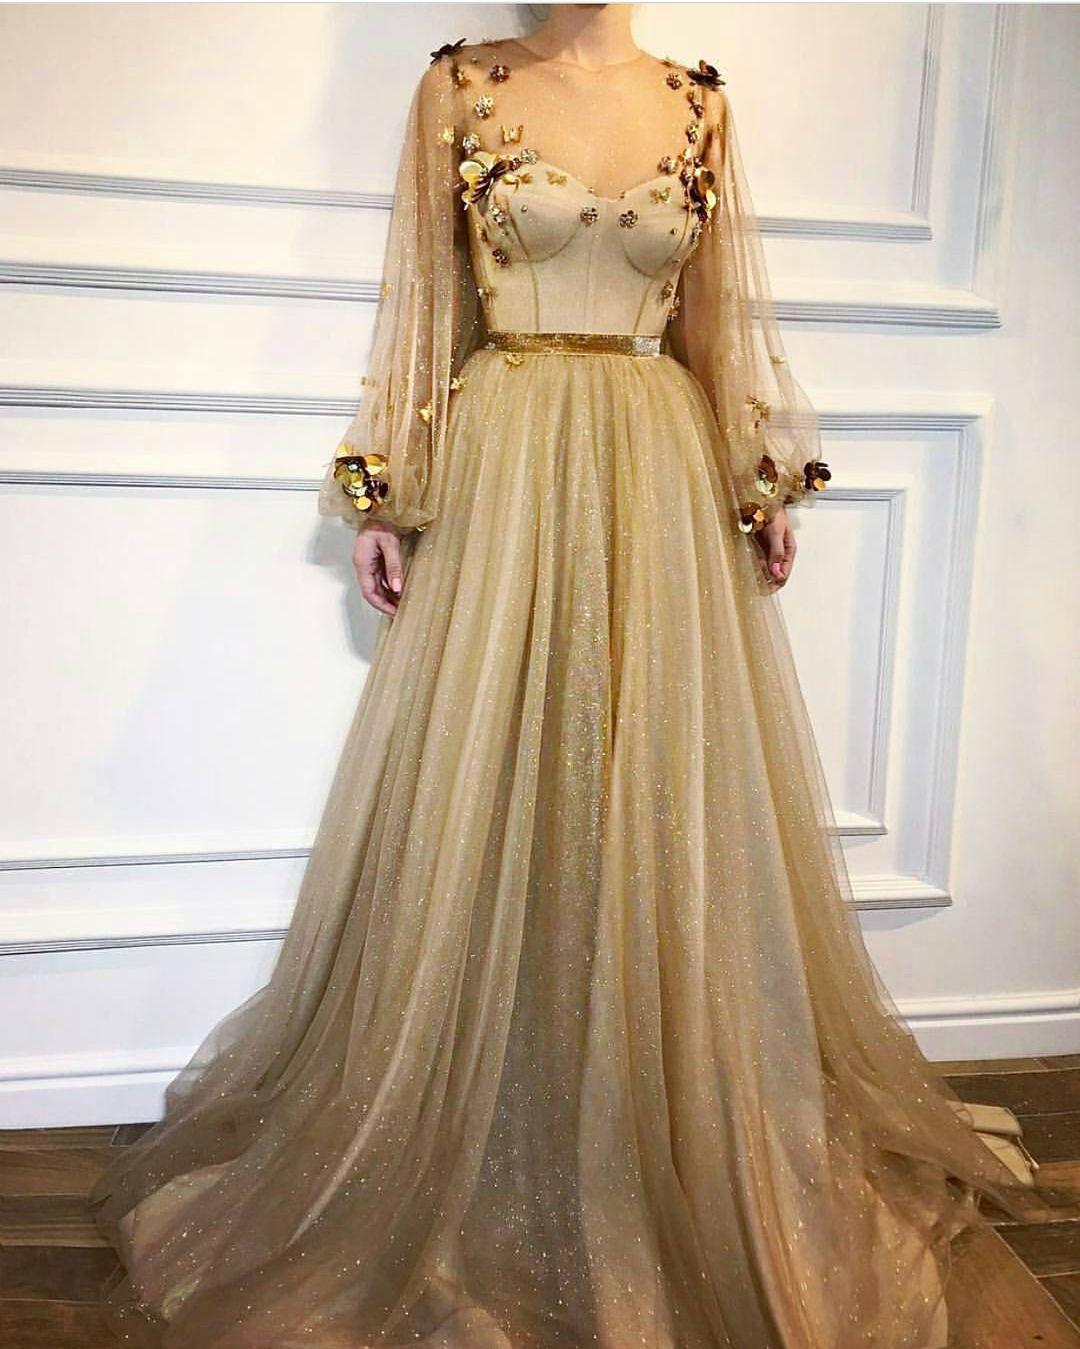 يجنن الفستان سنابي Divaa Ffashion فولو ولايك الله يسعدكم زواج Prom Dresses With Sleeves Prom Dresses Long With Sleeves Prom Dresses Long